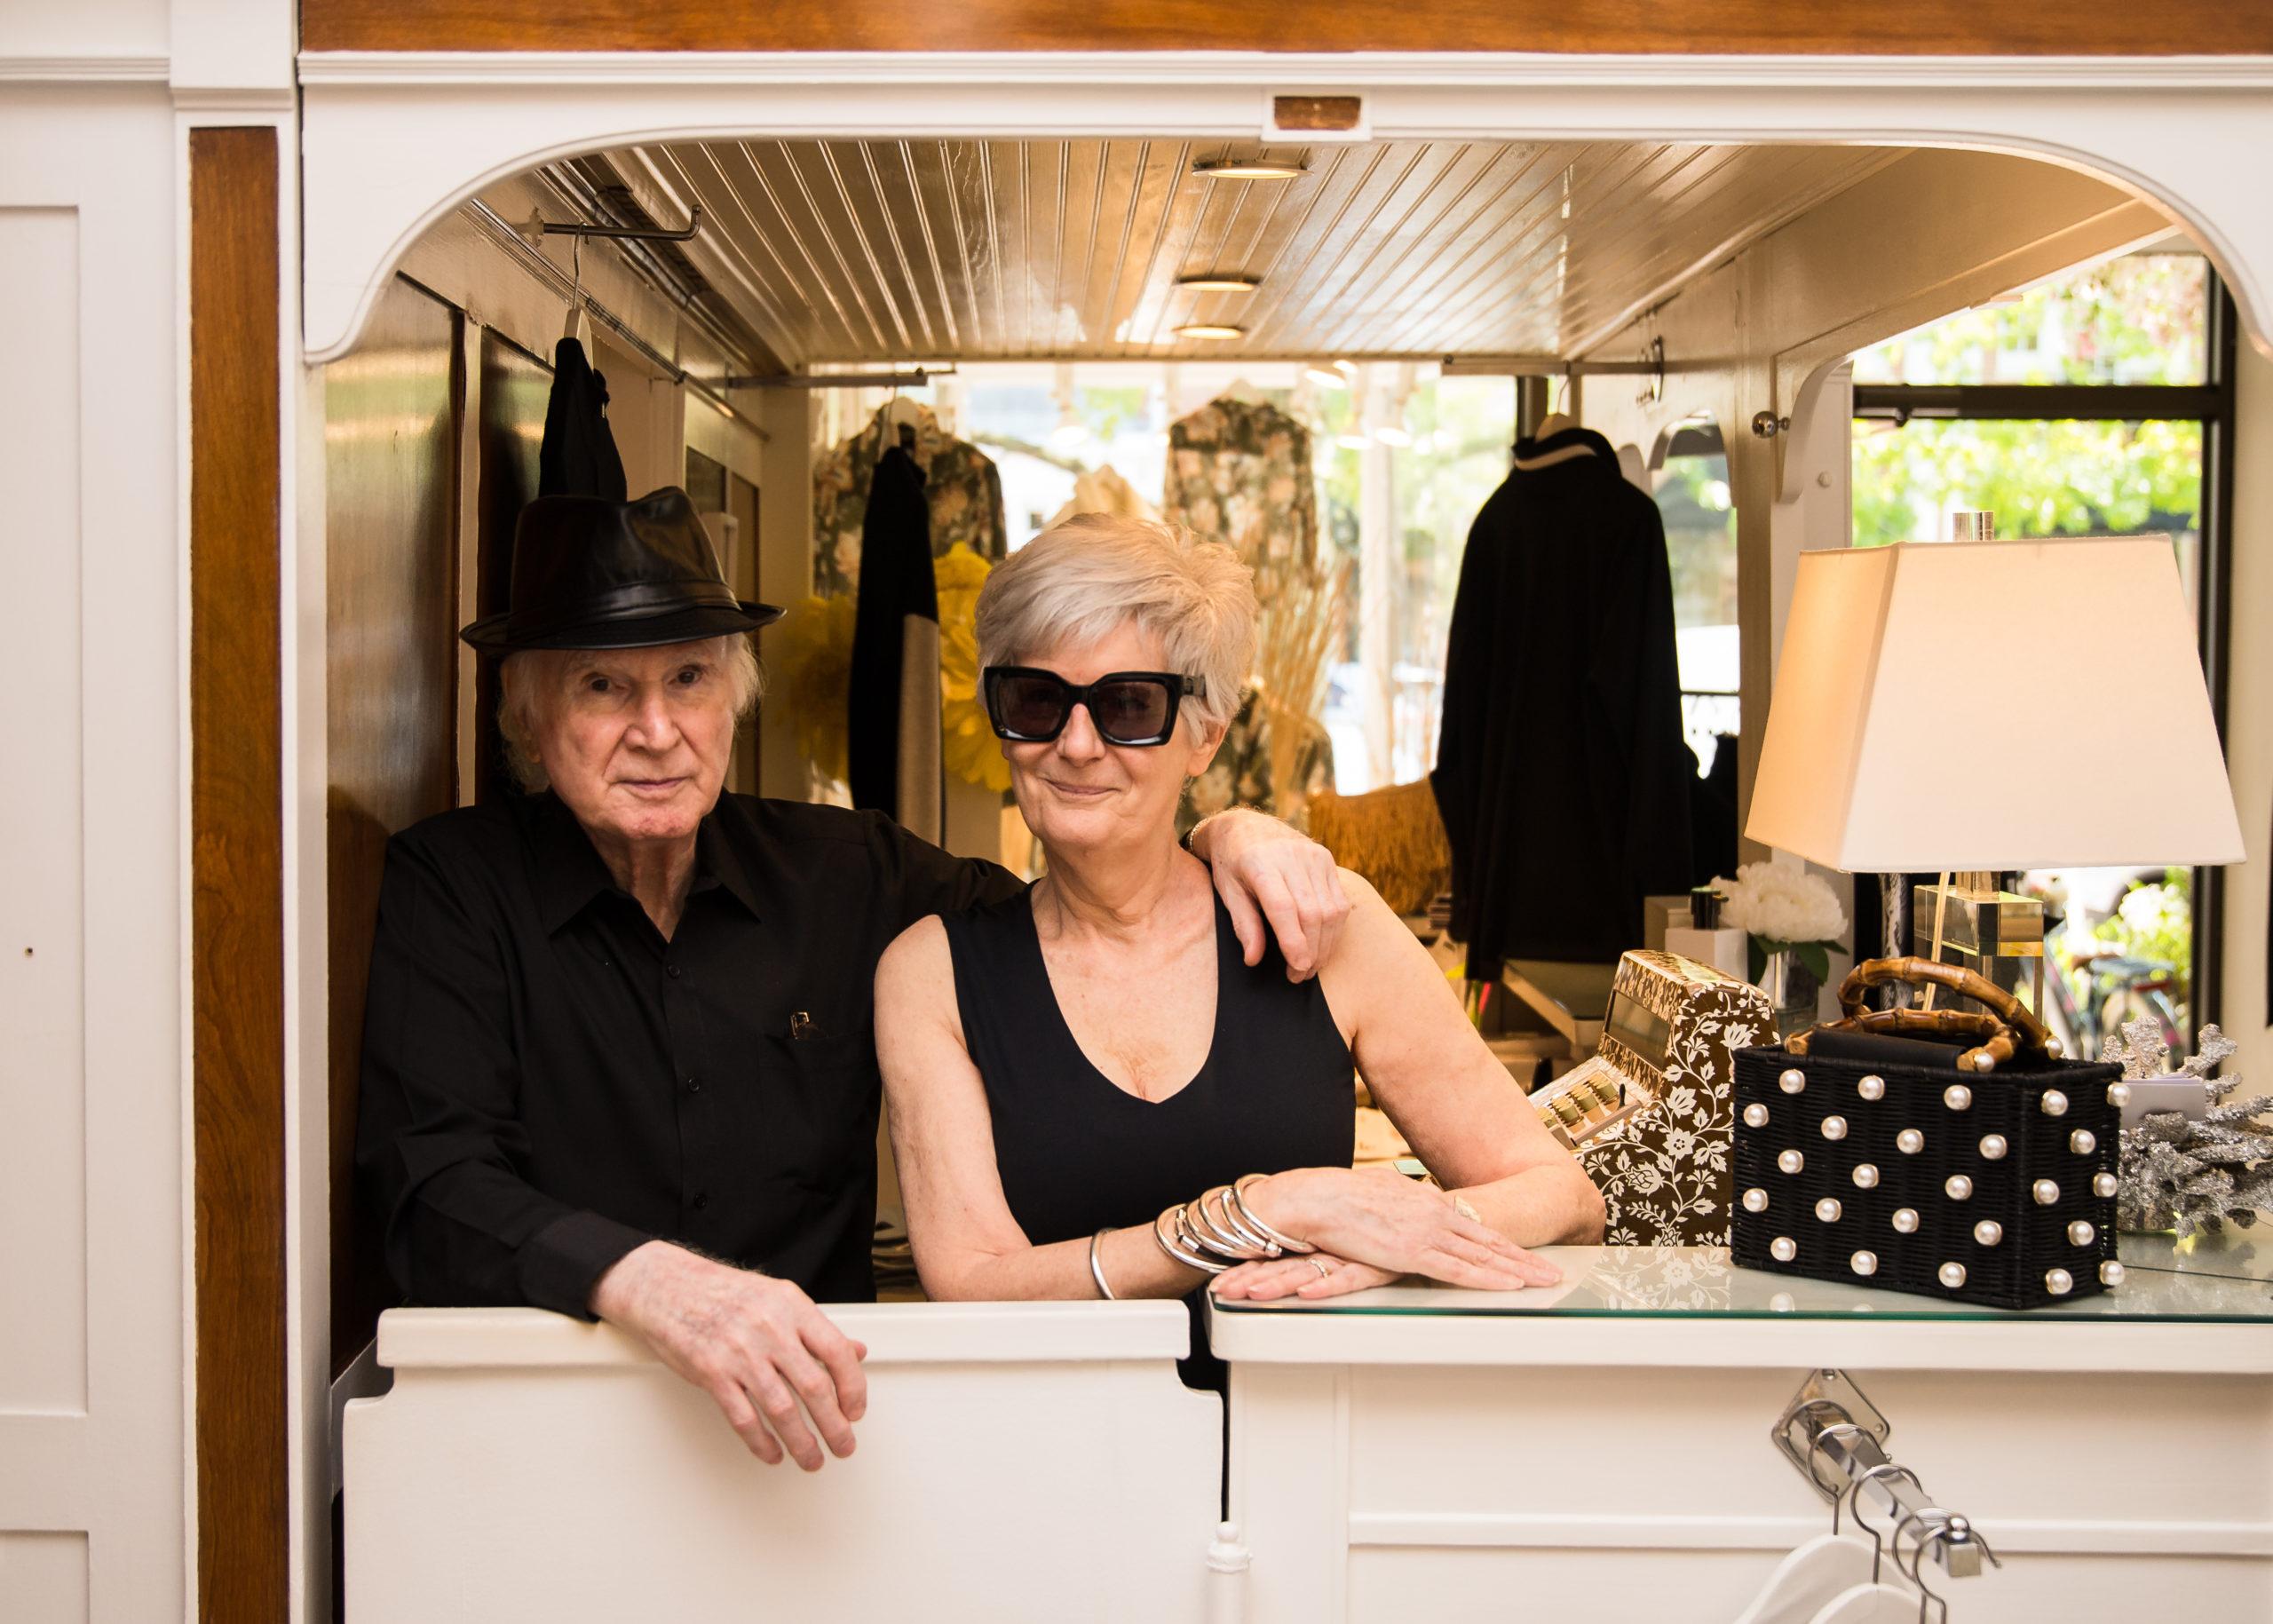 Deborah Ohana has earned loyal customers over the years who appreciate her fashion sense and eye for what looks good.